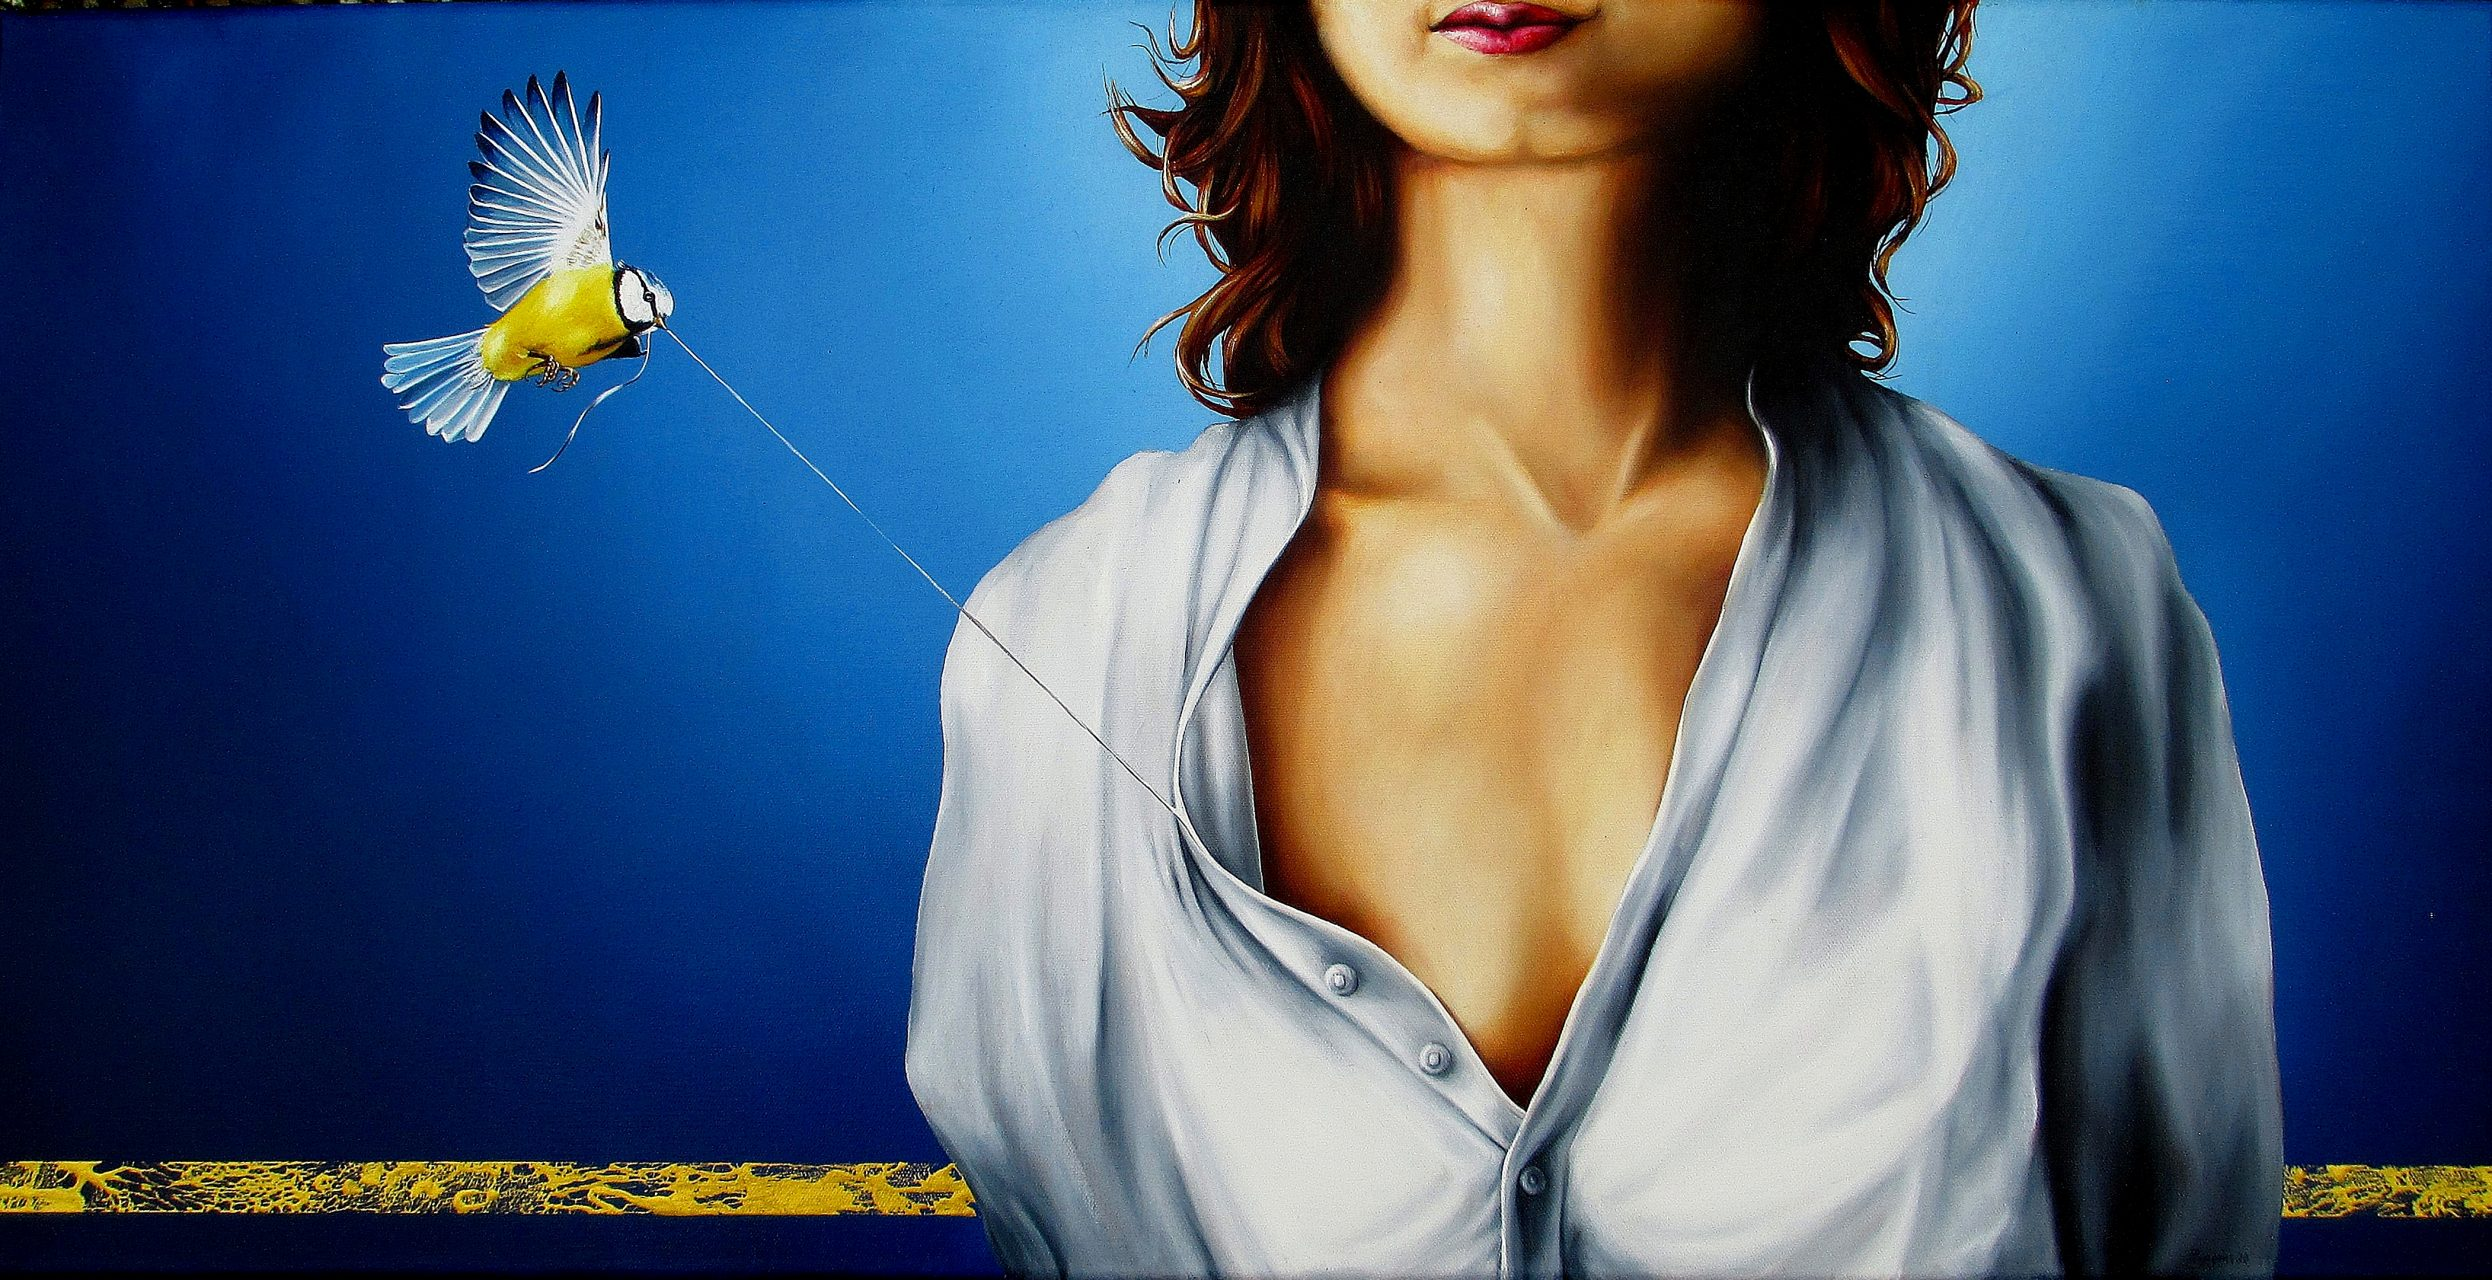 Beflügelter Moment 50 x 100 cm Öl, Acryl auf Leinwand